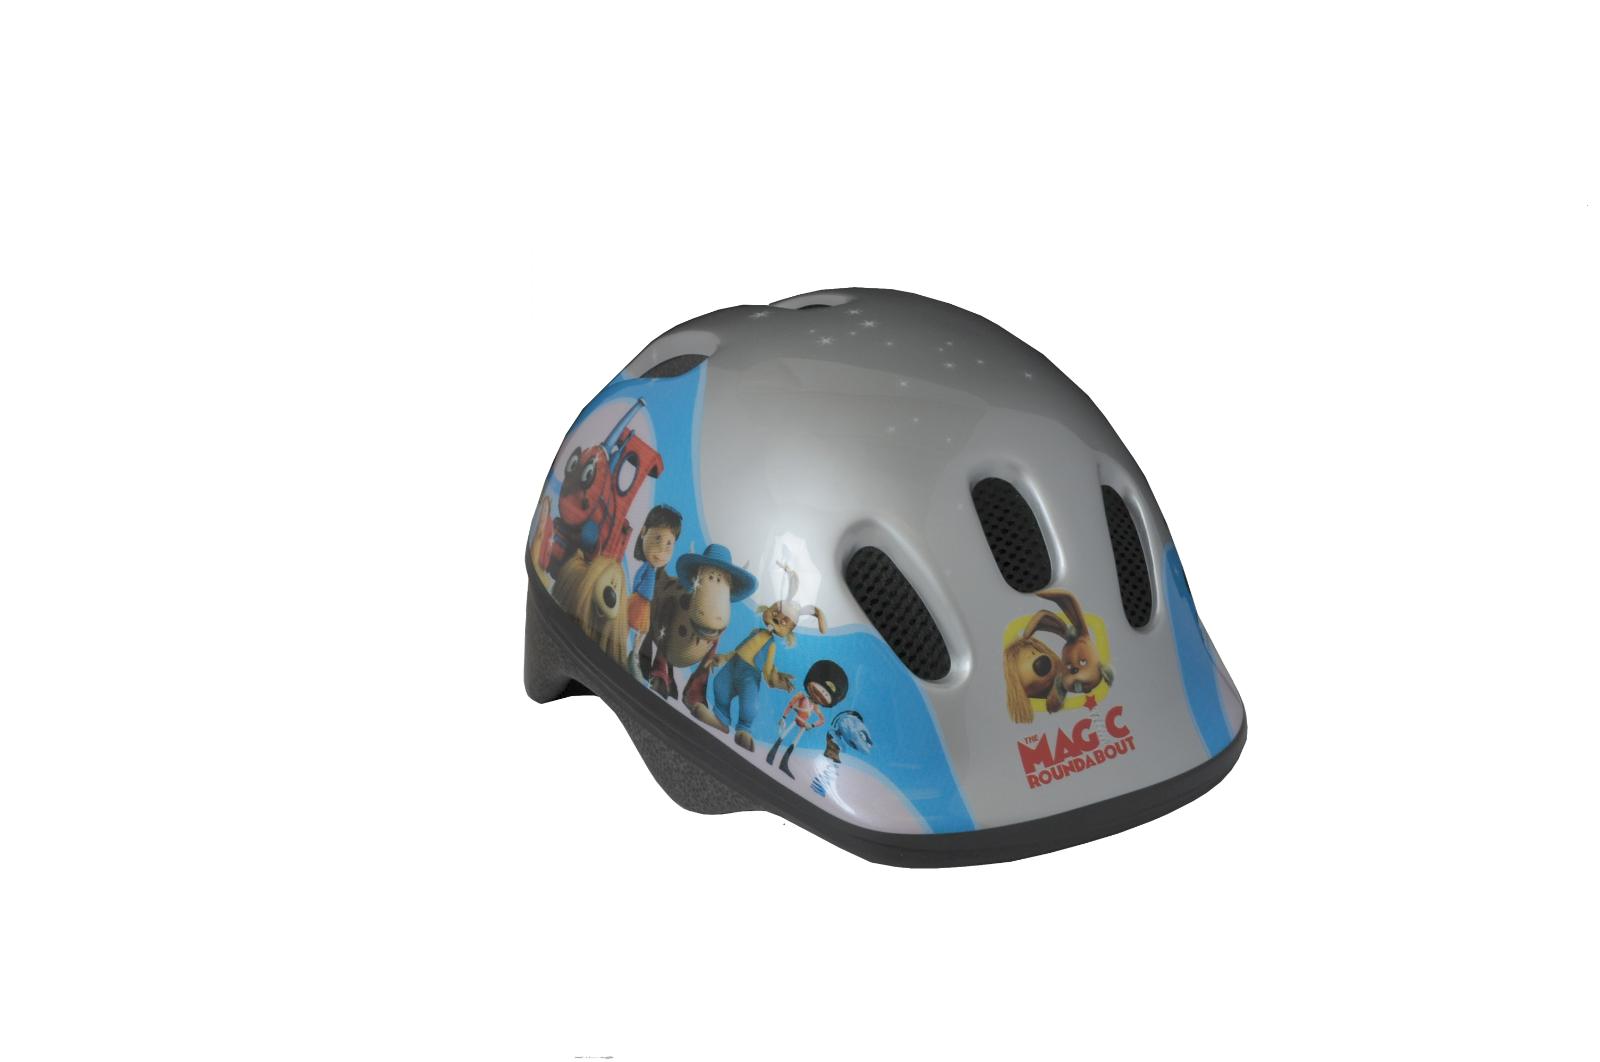 MAGIC ROUNDABOUT Kids Bike Set Accessory Helmet Horn Basket Bottle Saddle Cover